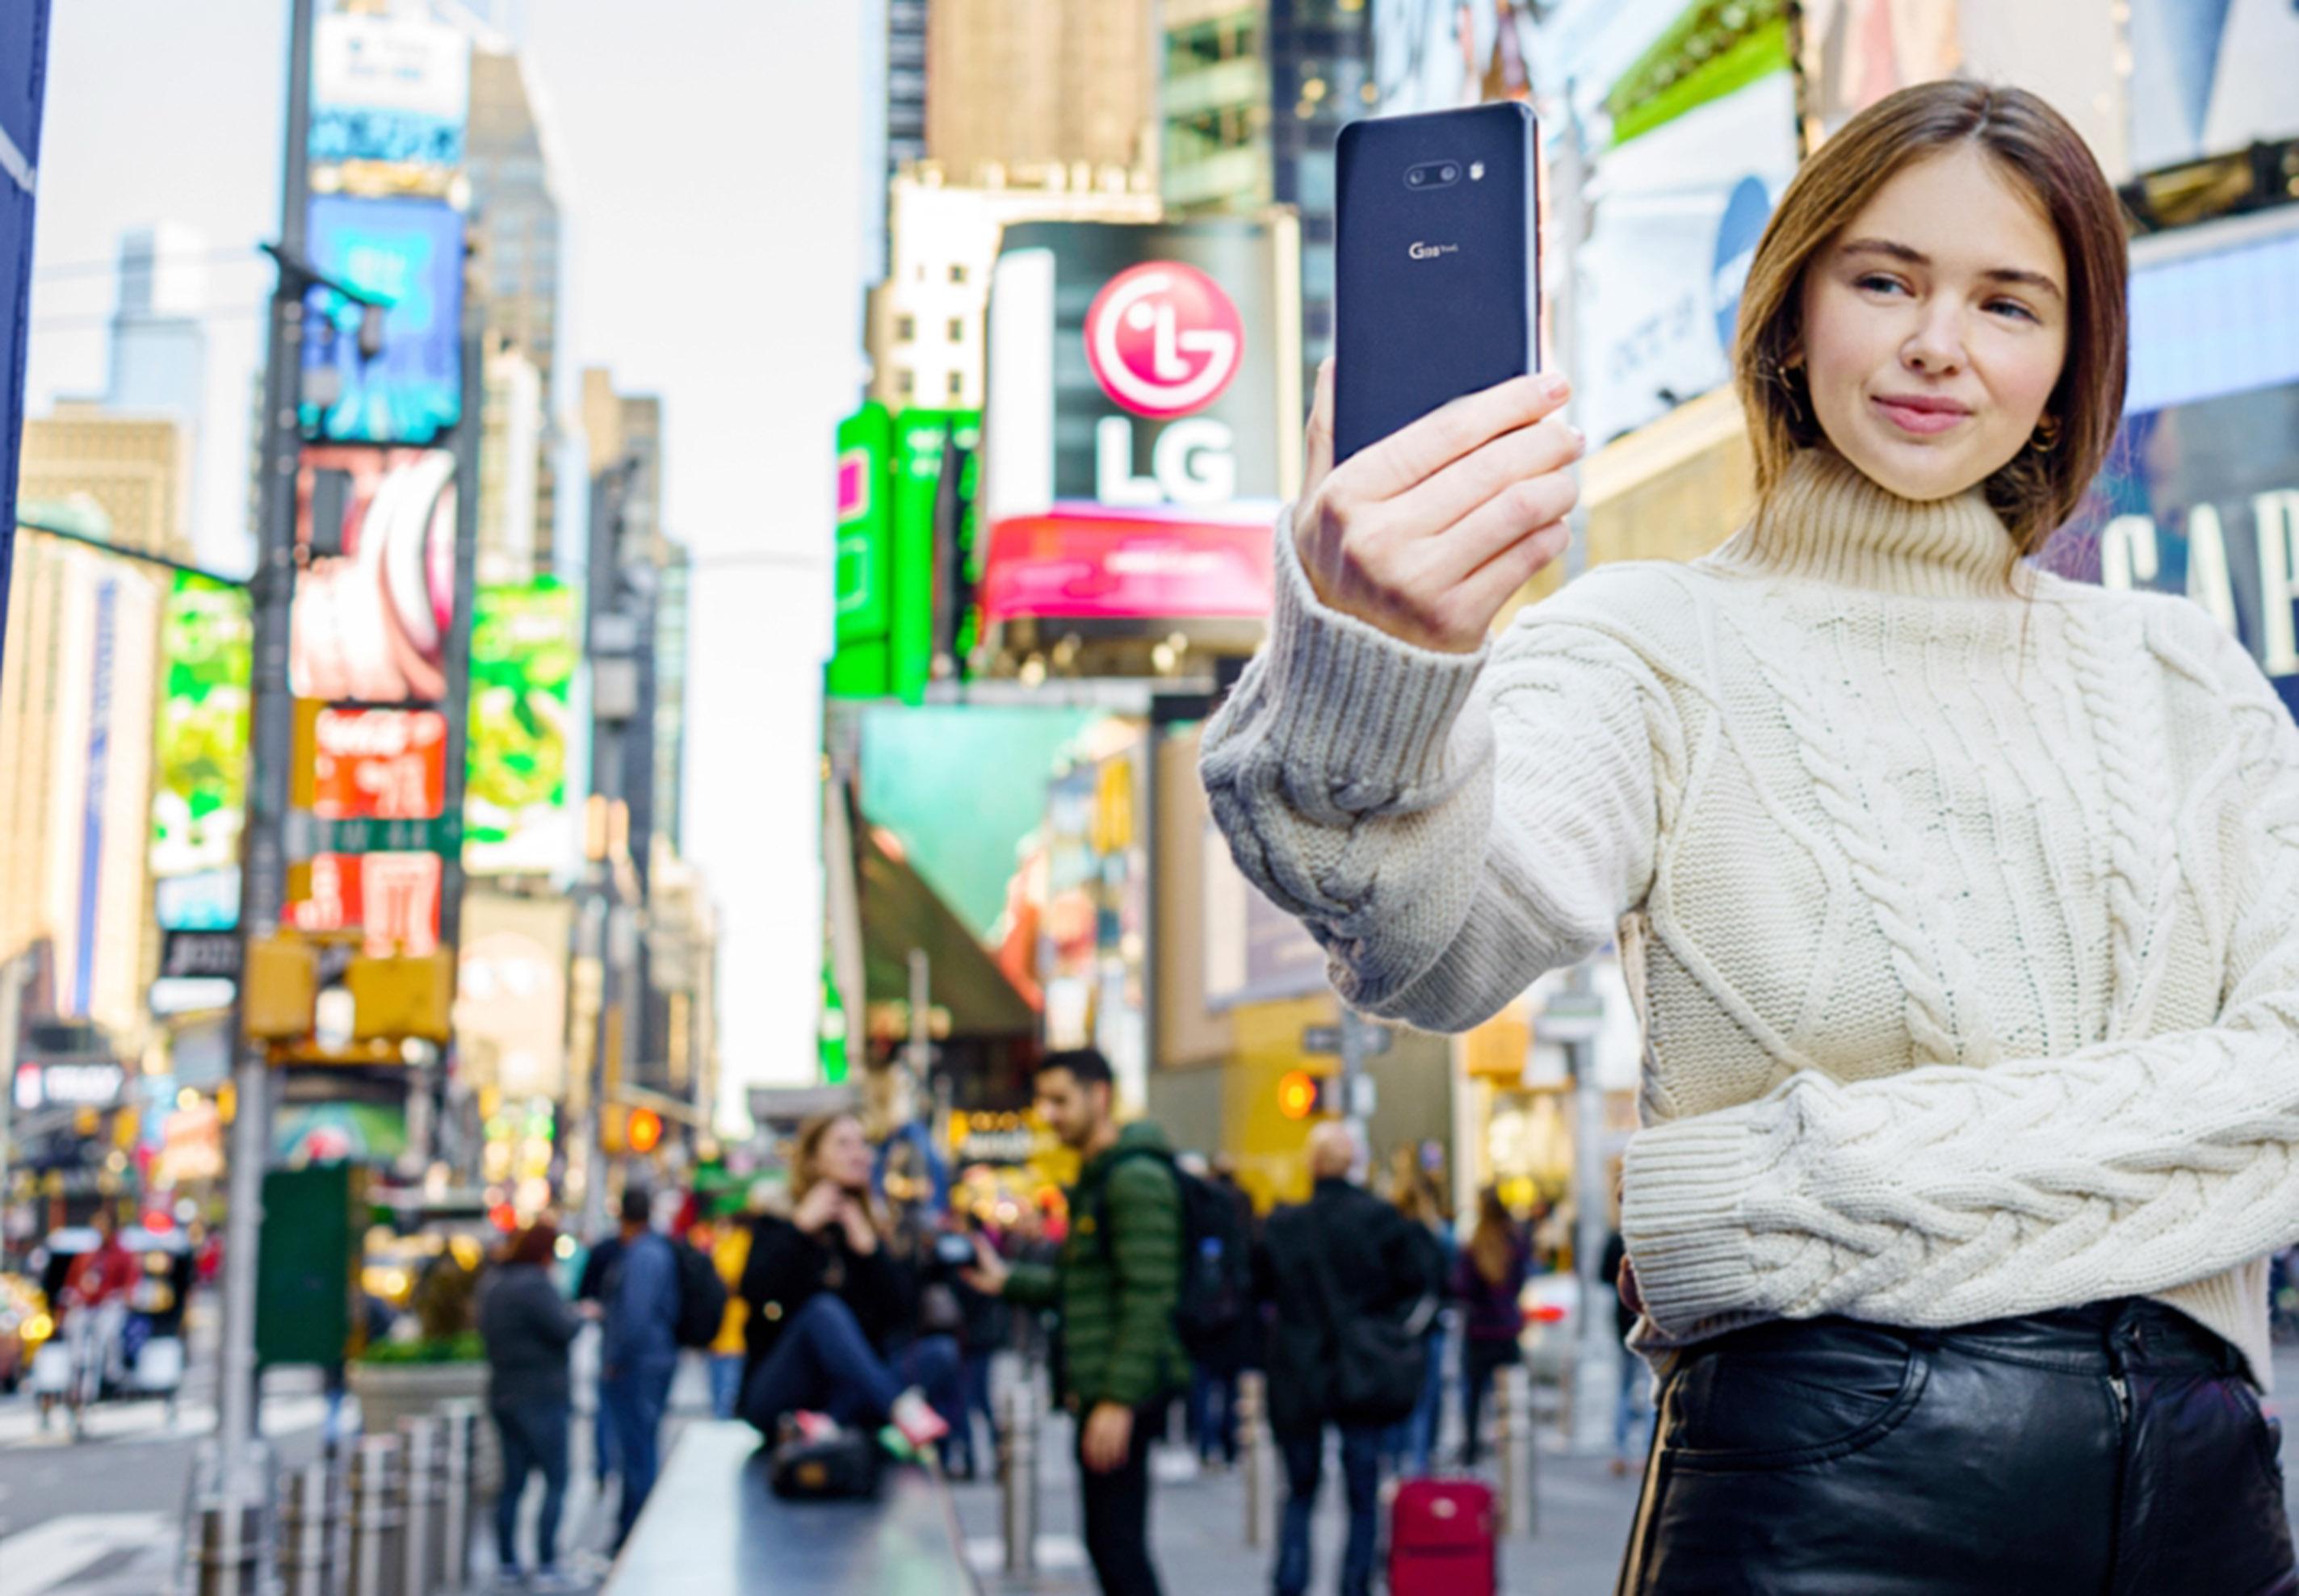 LG전자가 내달 1일 LG G8X ThinQ를 미국, 캐나다 등 북미시장에 순차 출시한다. LG전자 모델이 미국 뉴욕 '타임스스퀘어(Times Square)'에서 LG G8X ThinQ를 소개하고 있다.